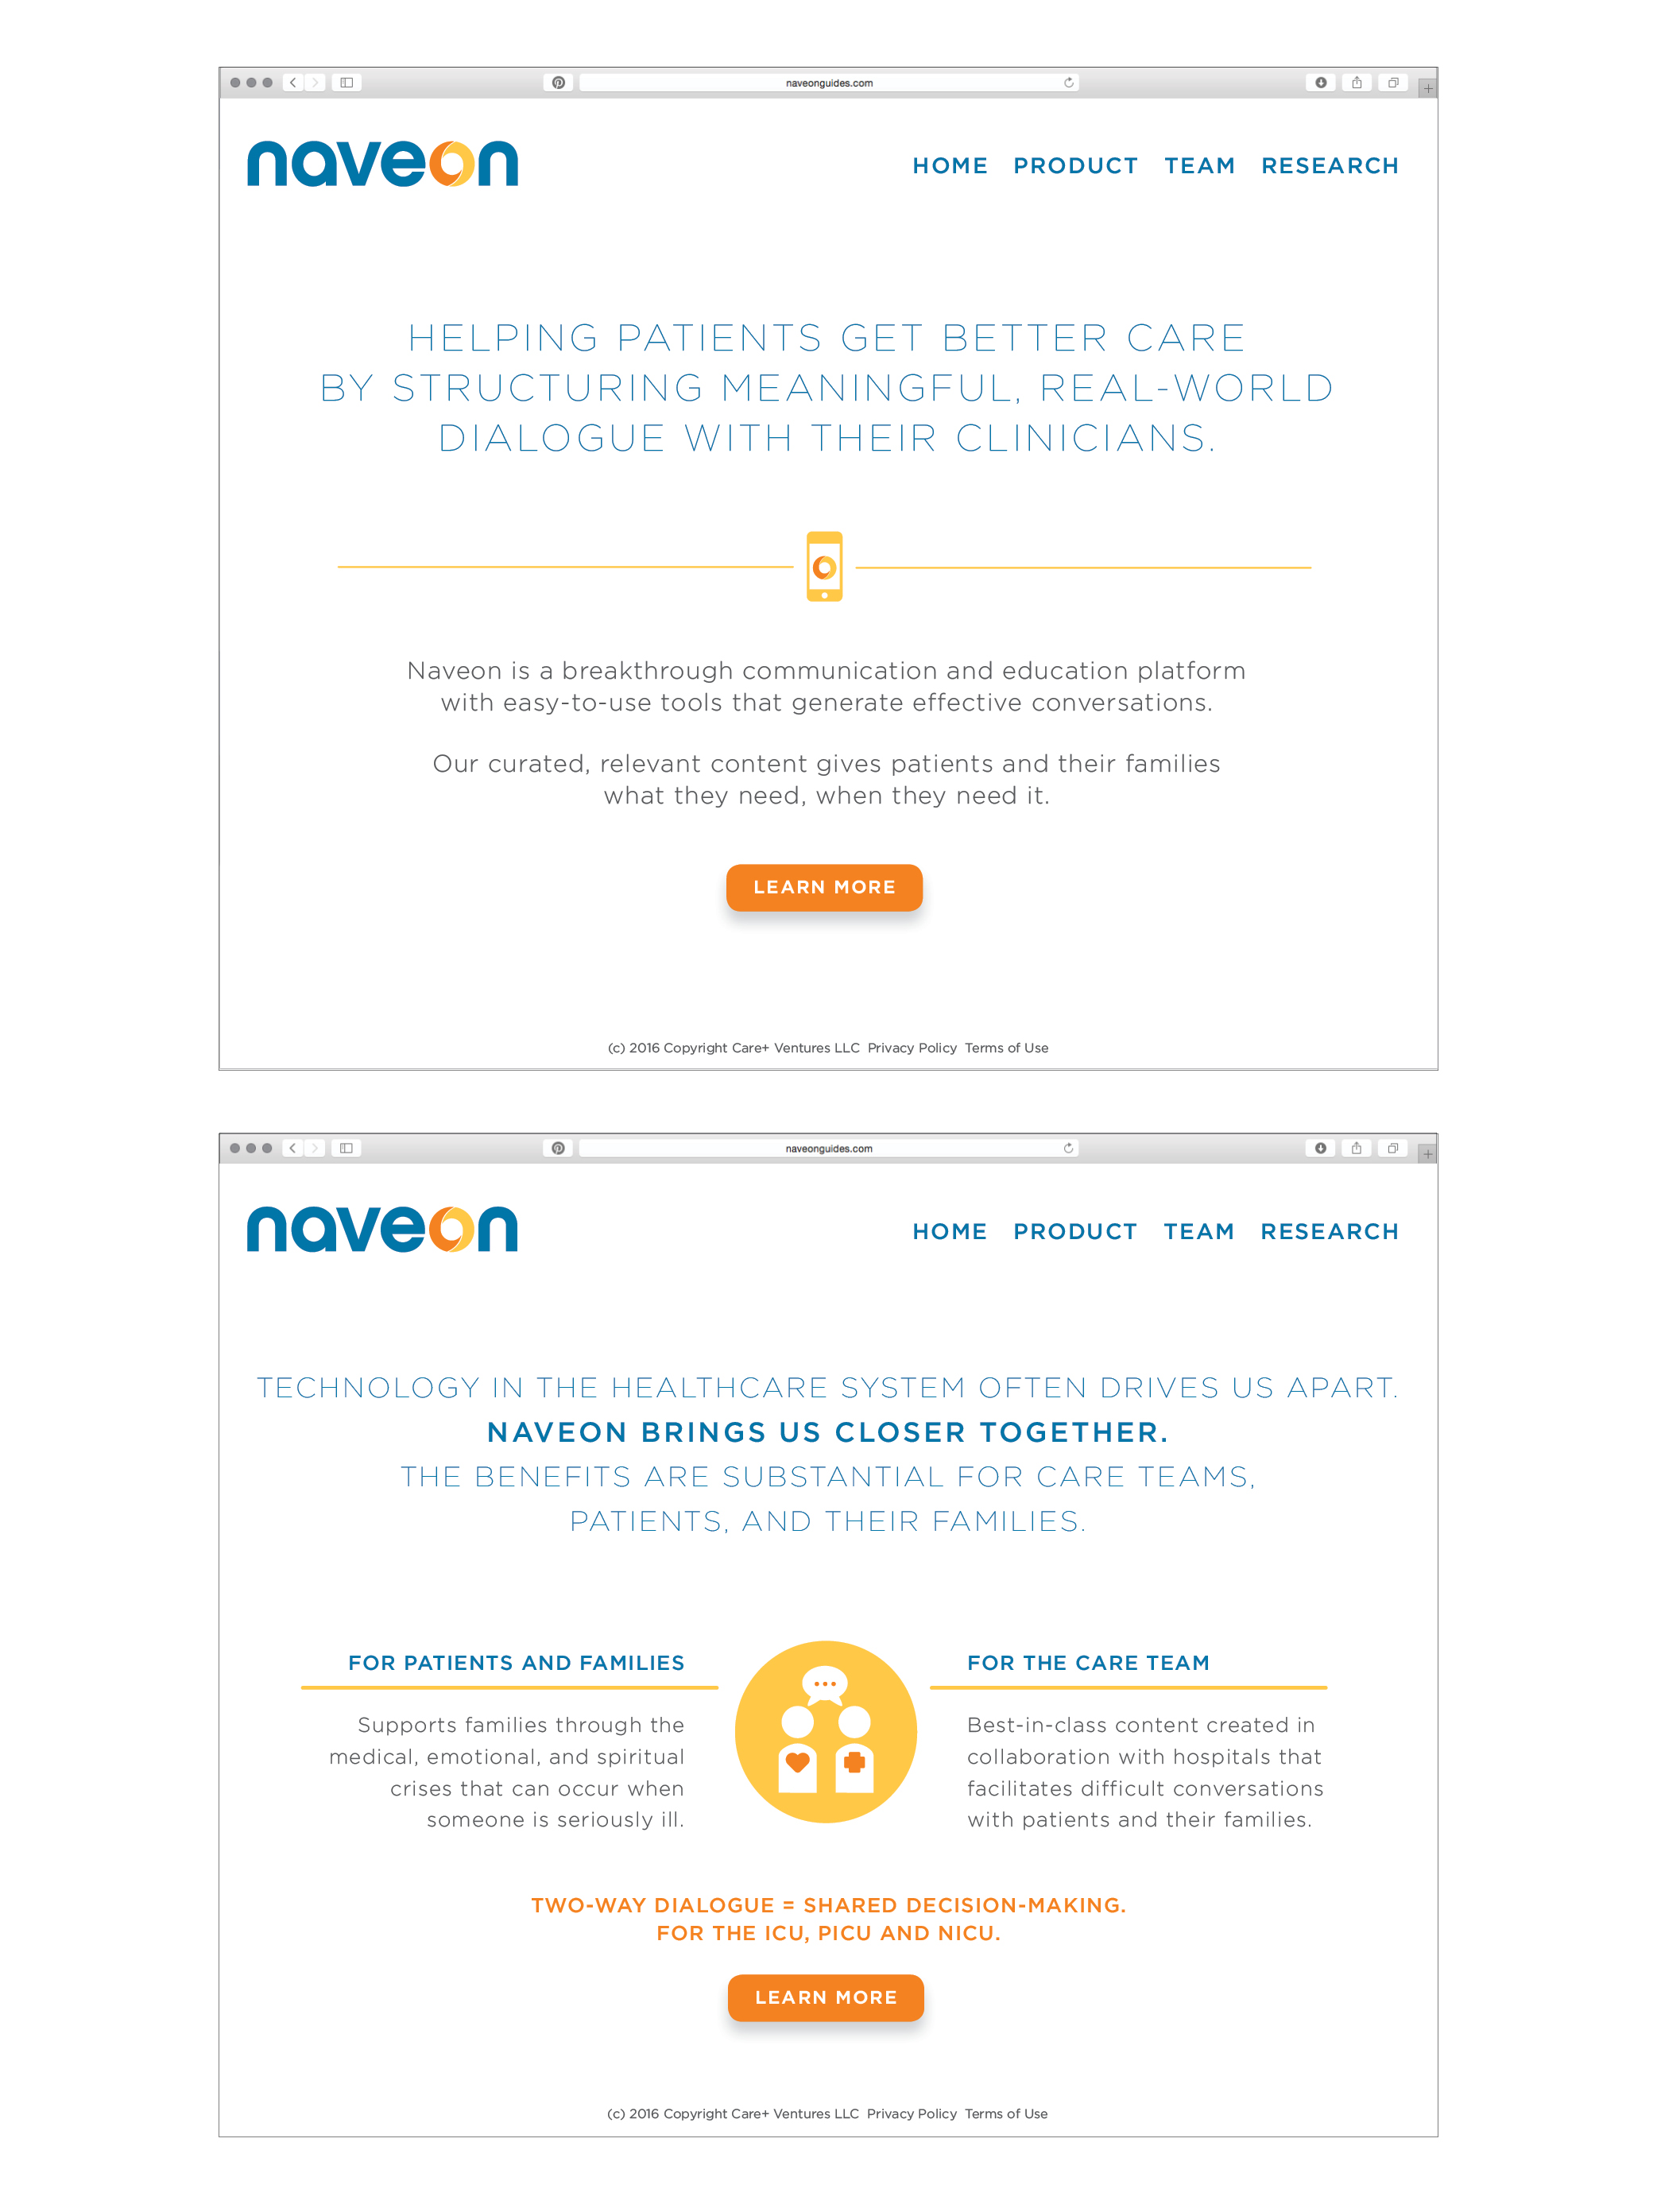 Naveon slideshow images4.jpg